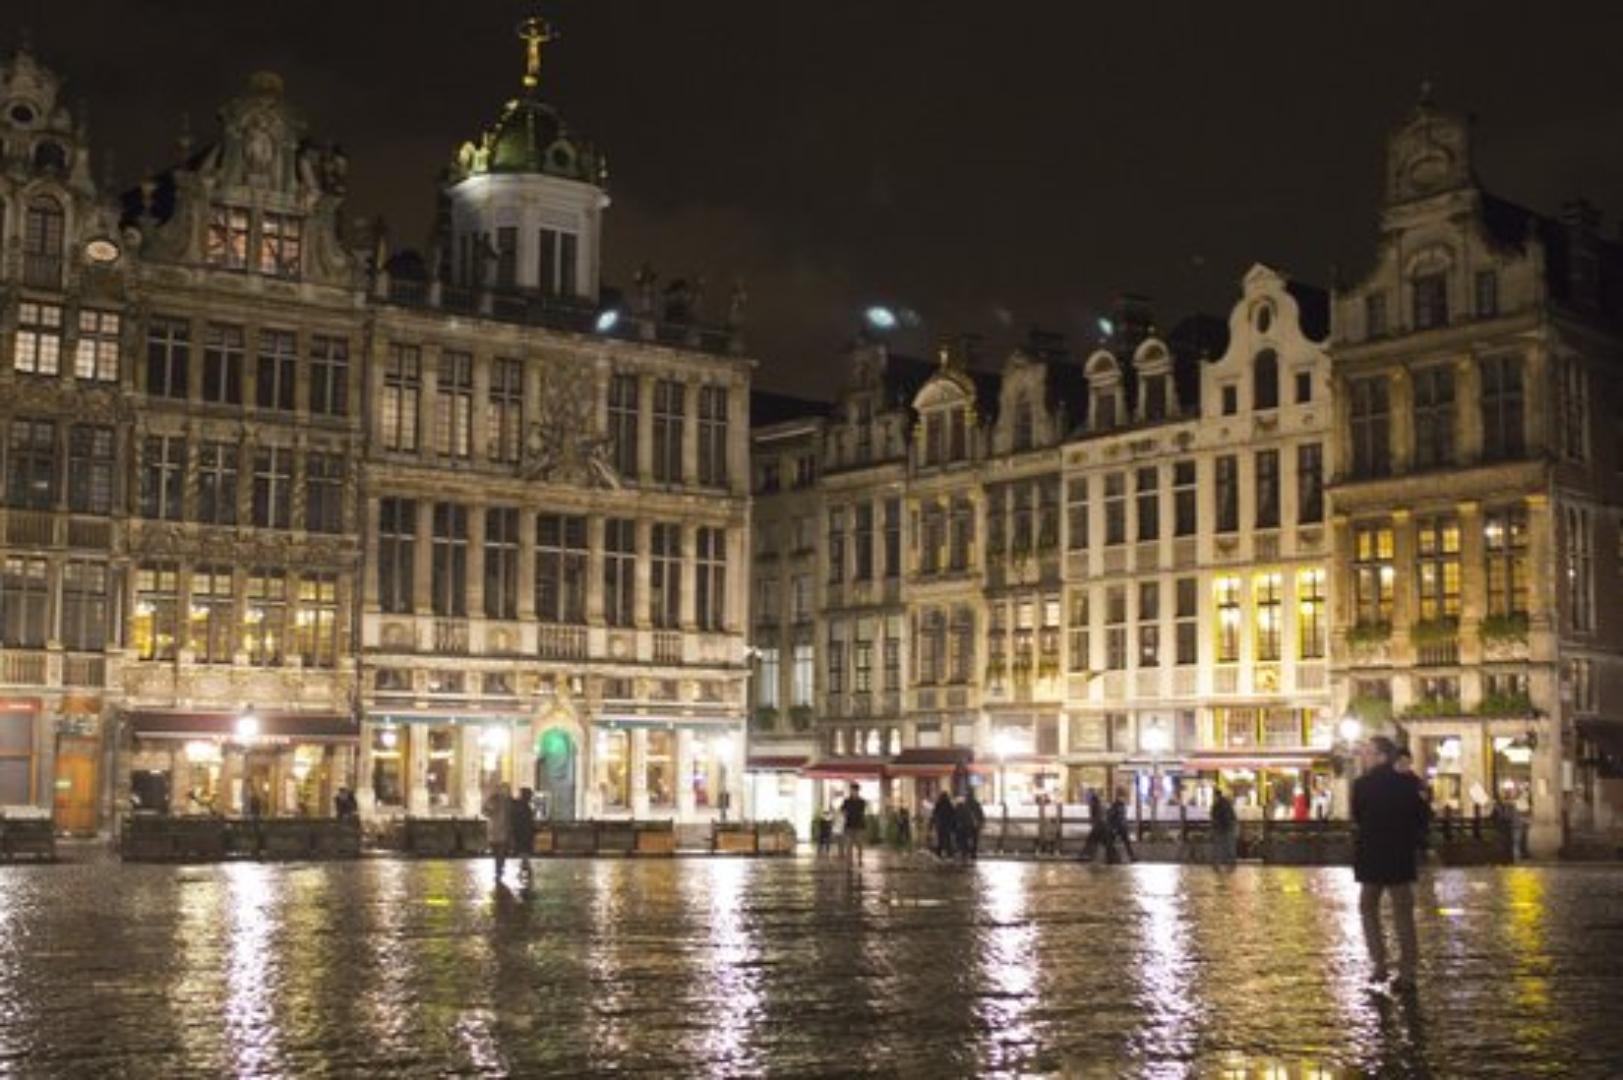 A river running through a city at Brussels@Heart.